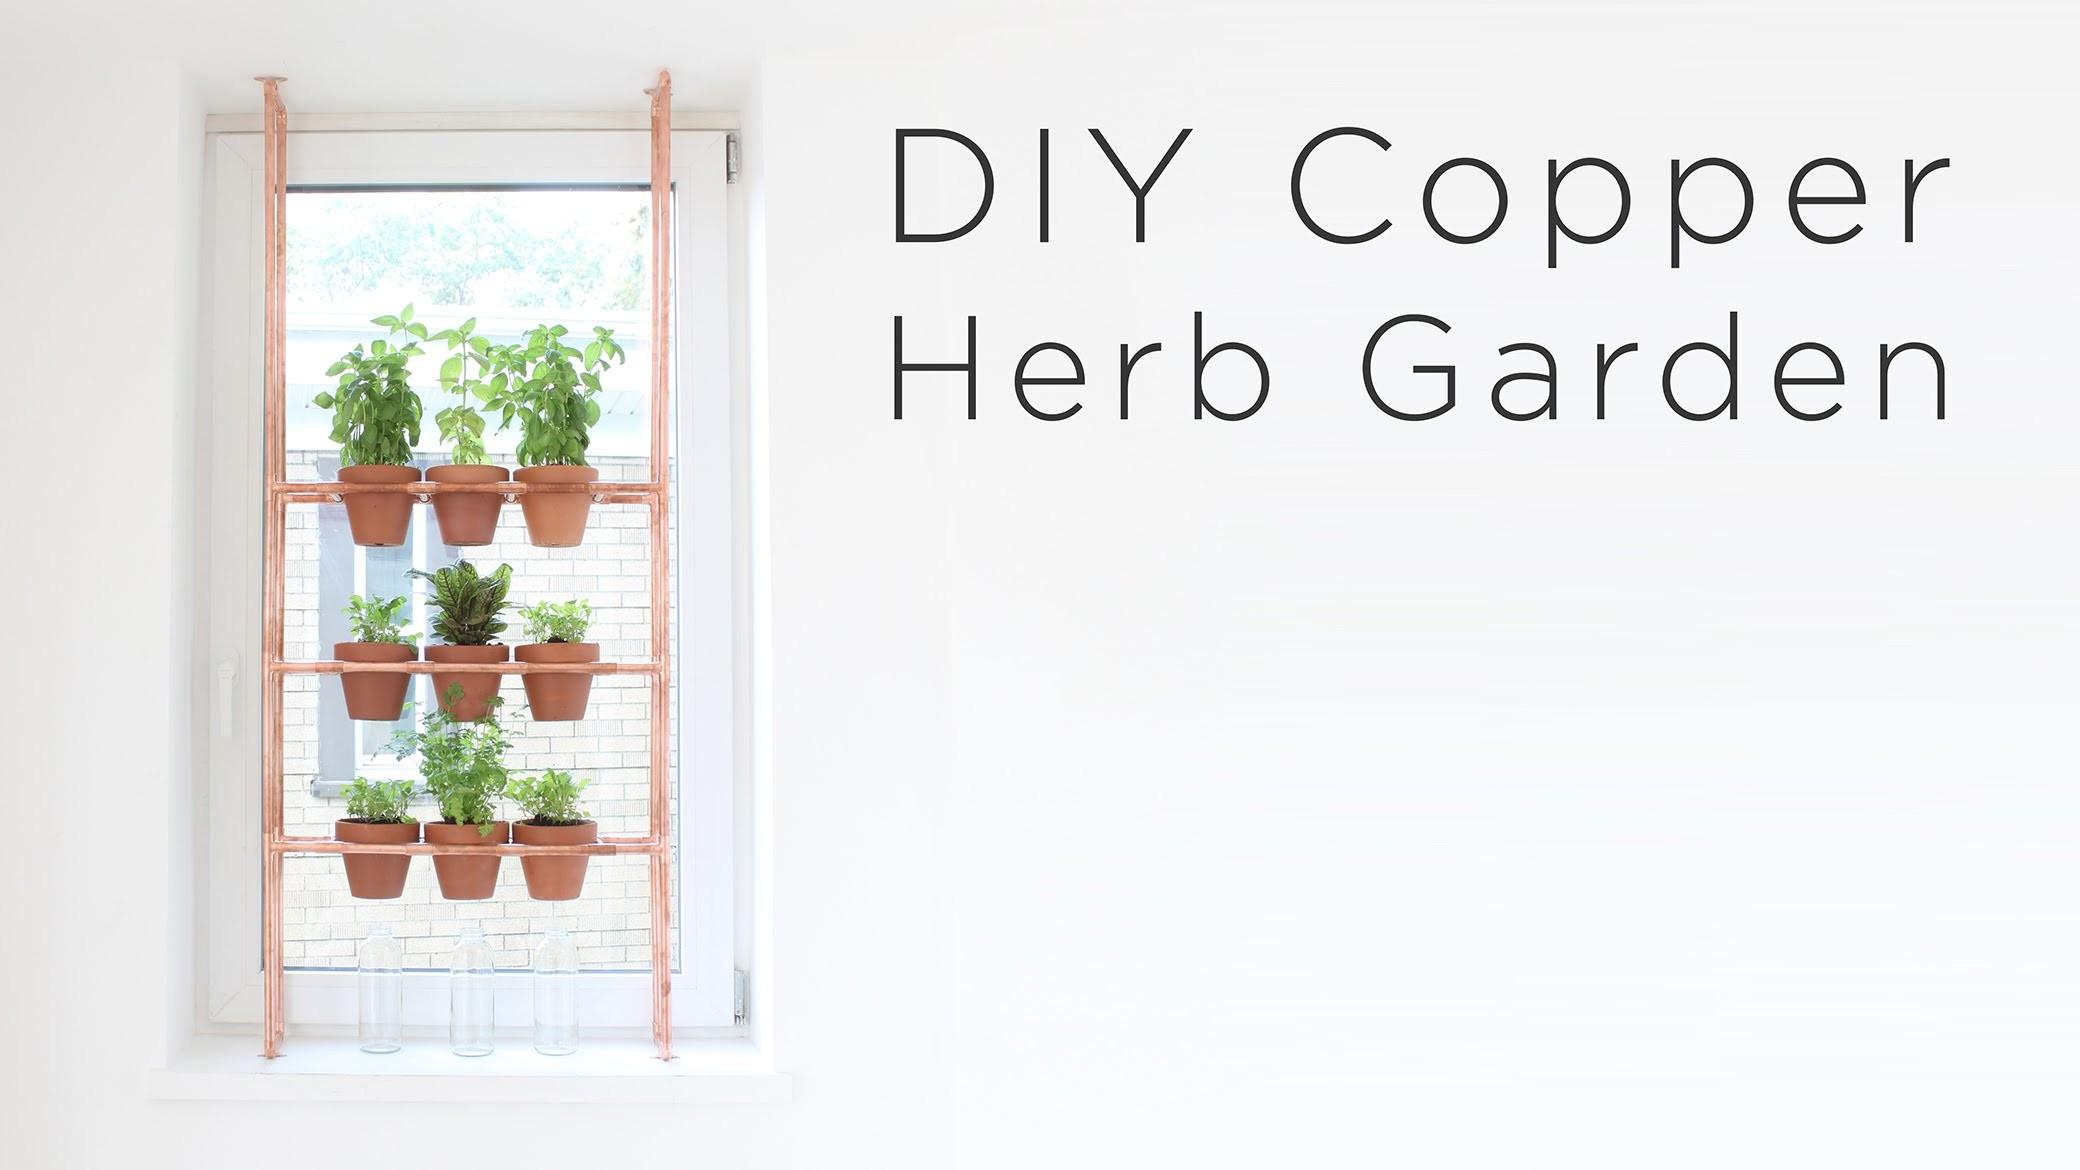 DIY Copper Herb Garden